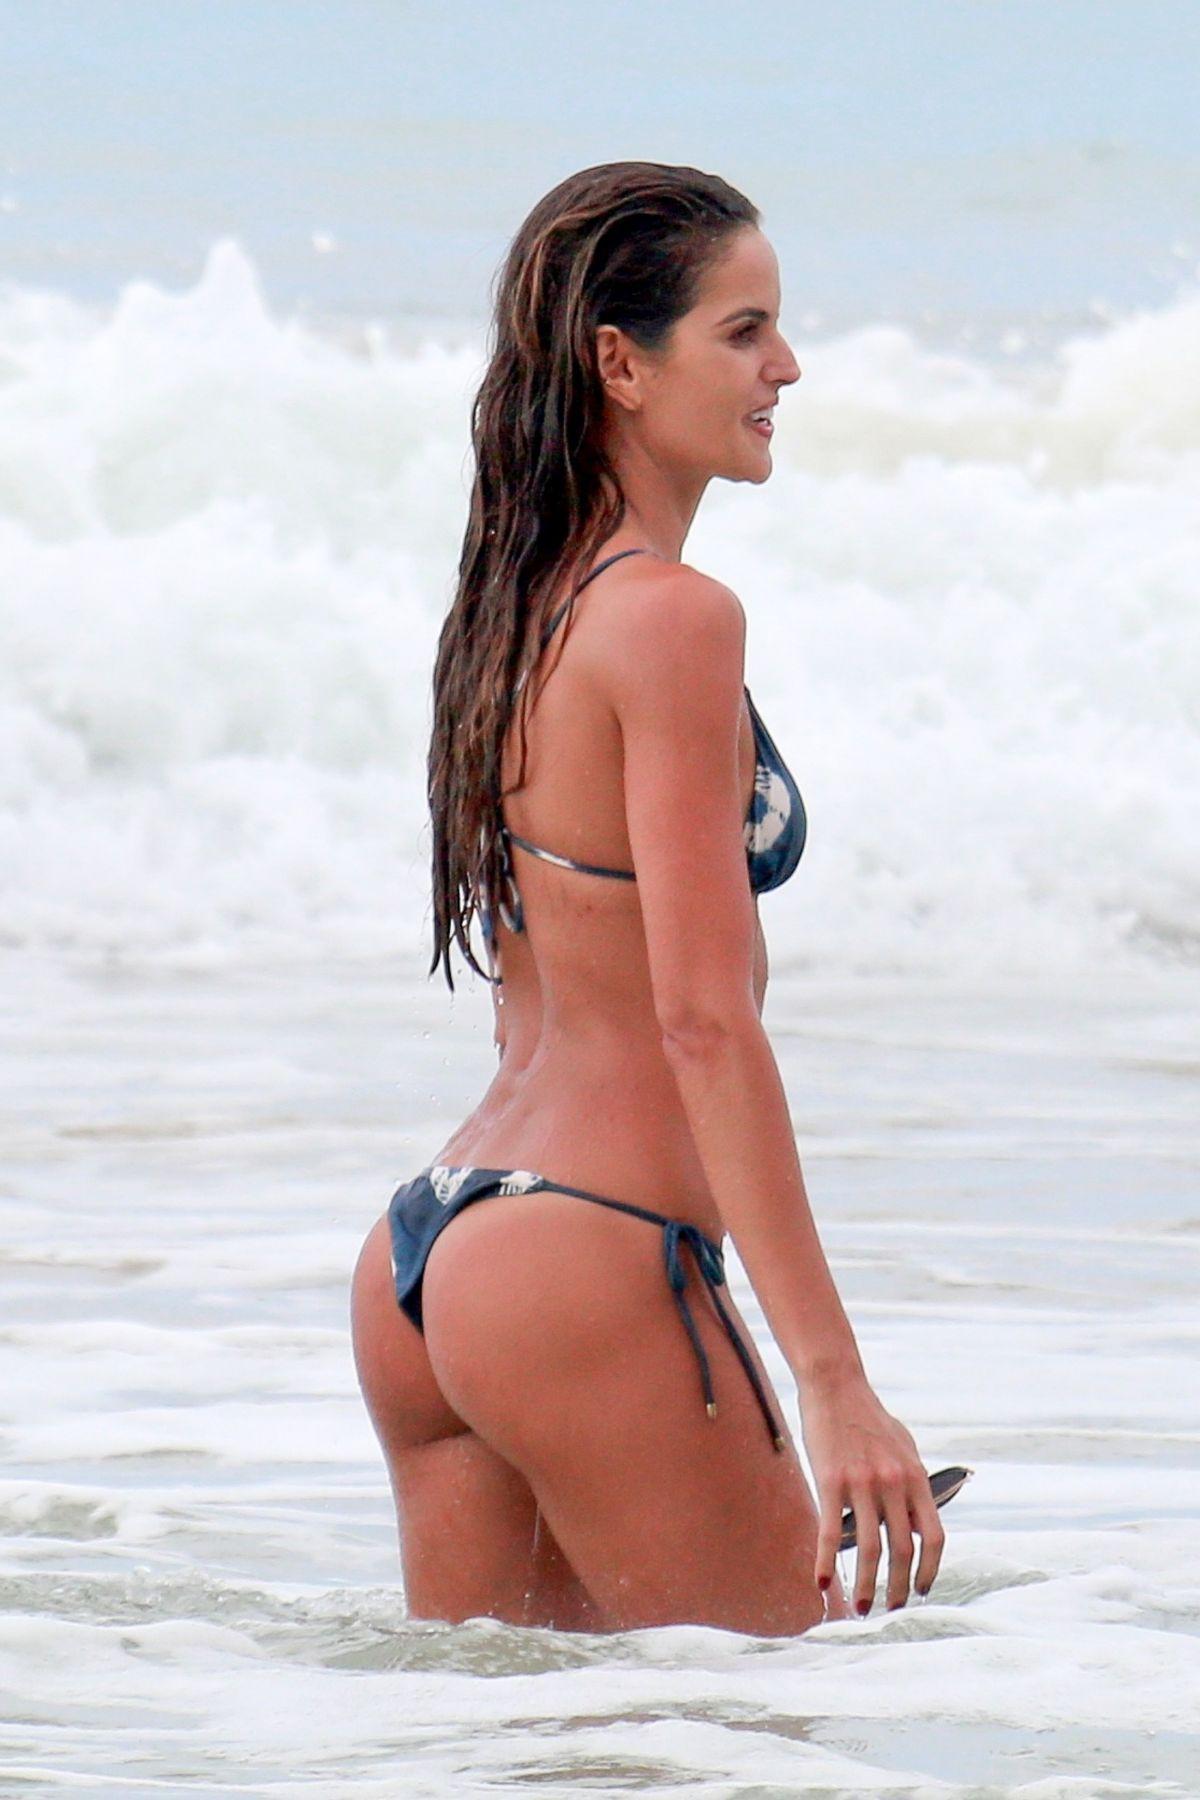 Izabel Goulart in Bikini and Kevin Trapp on the beach in Fernando de Noronha Pic 23 of 35